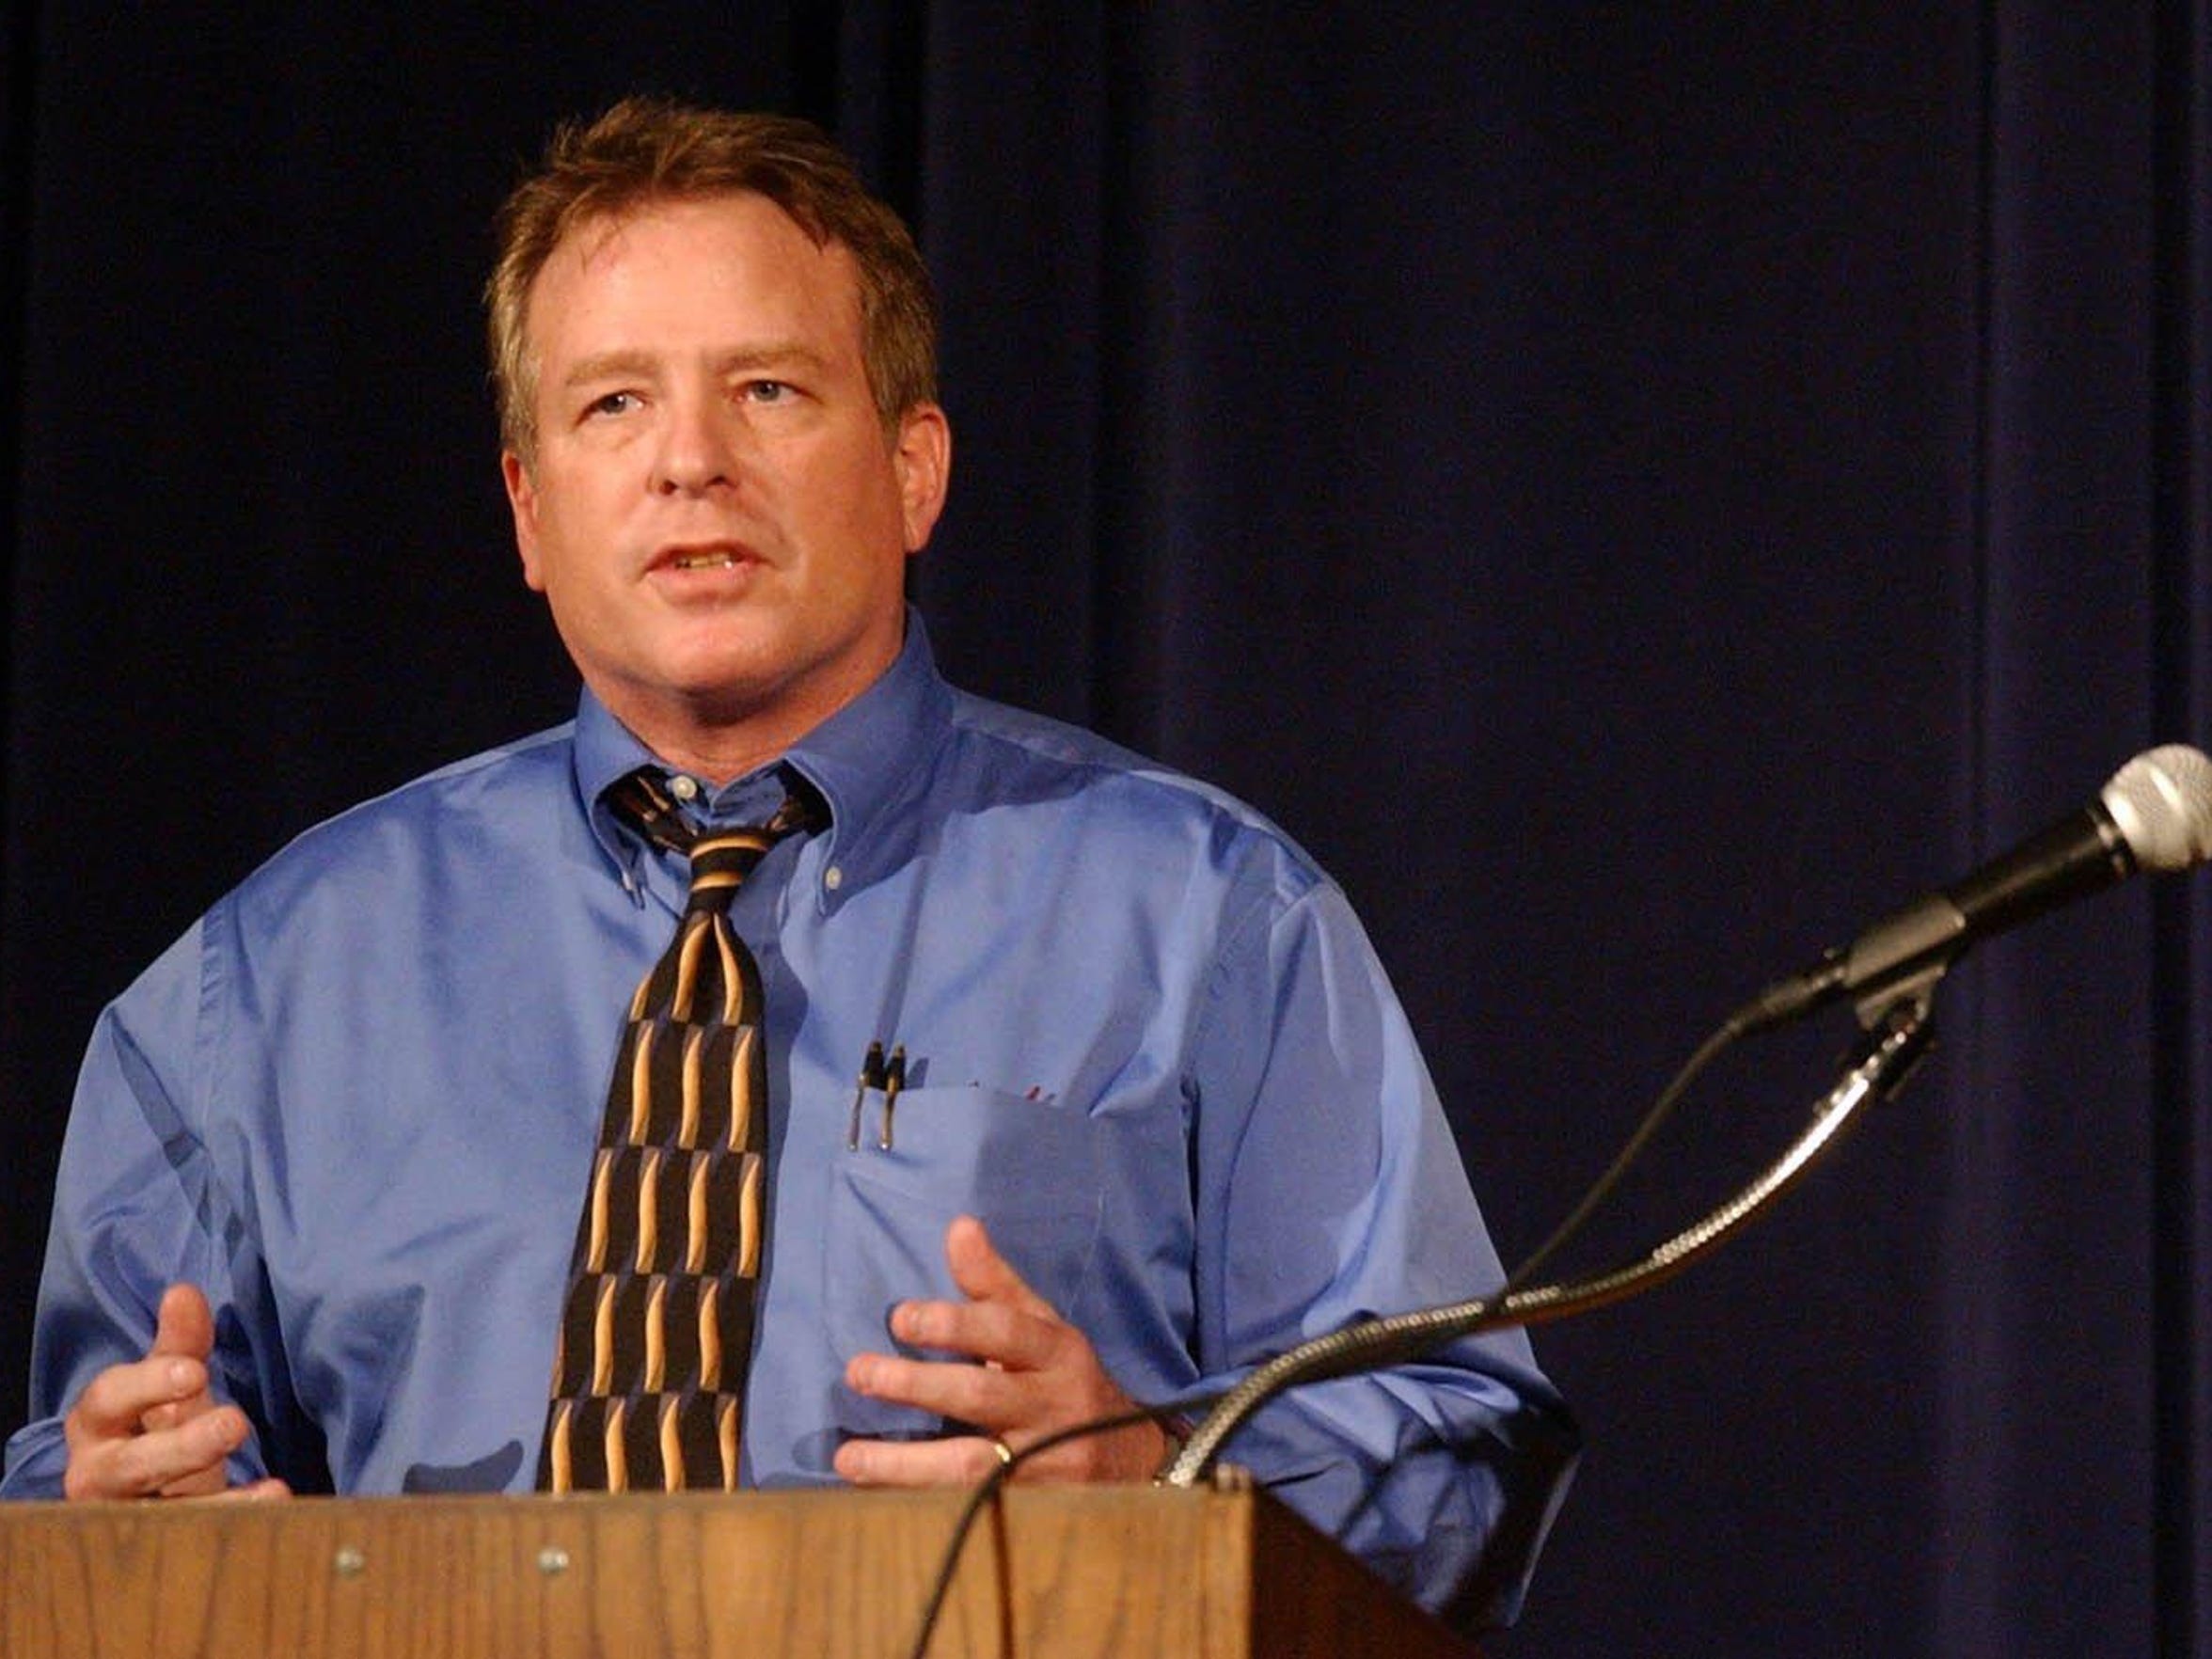 Keynote speaker Rob Lytle talks to ninth graders at